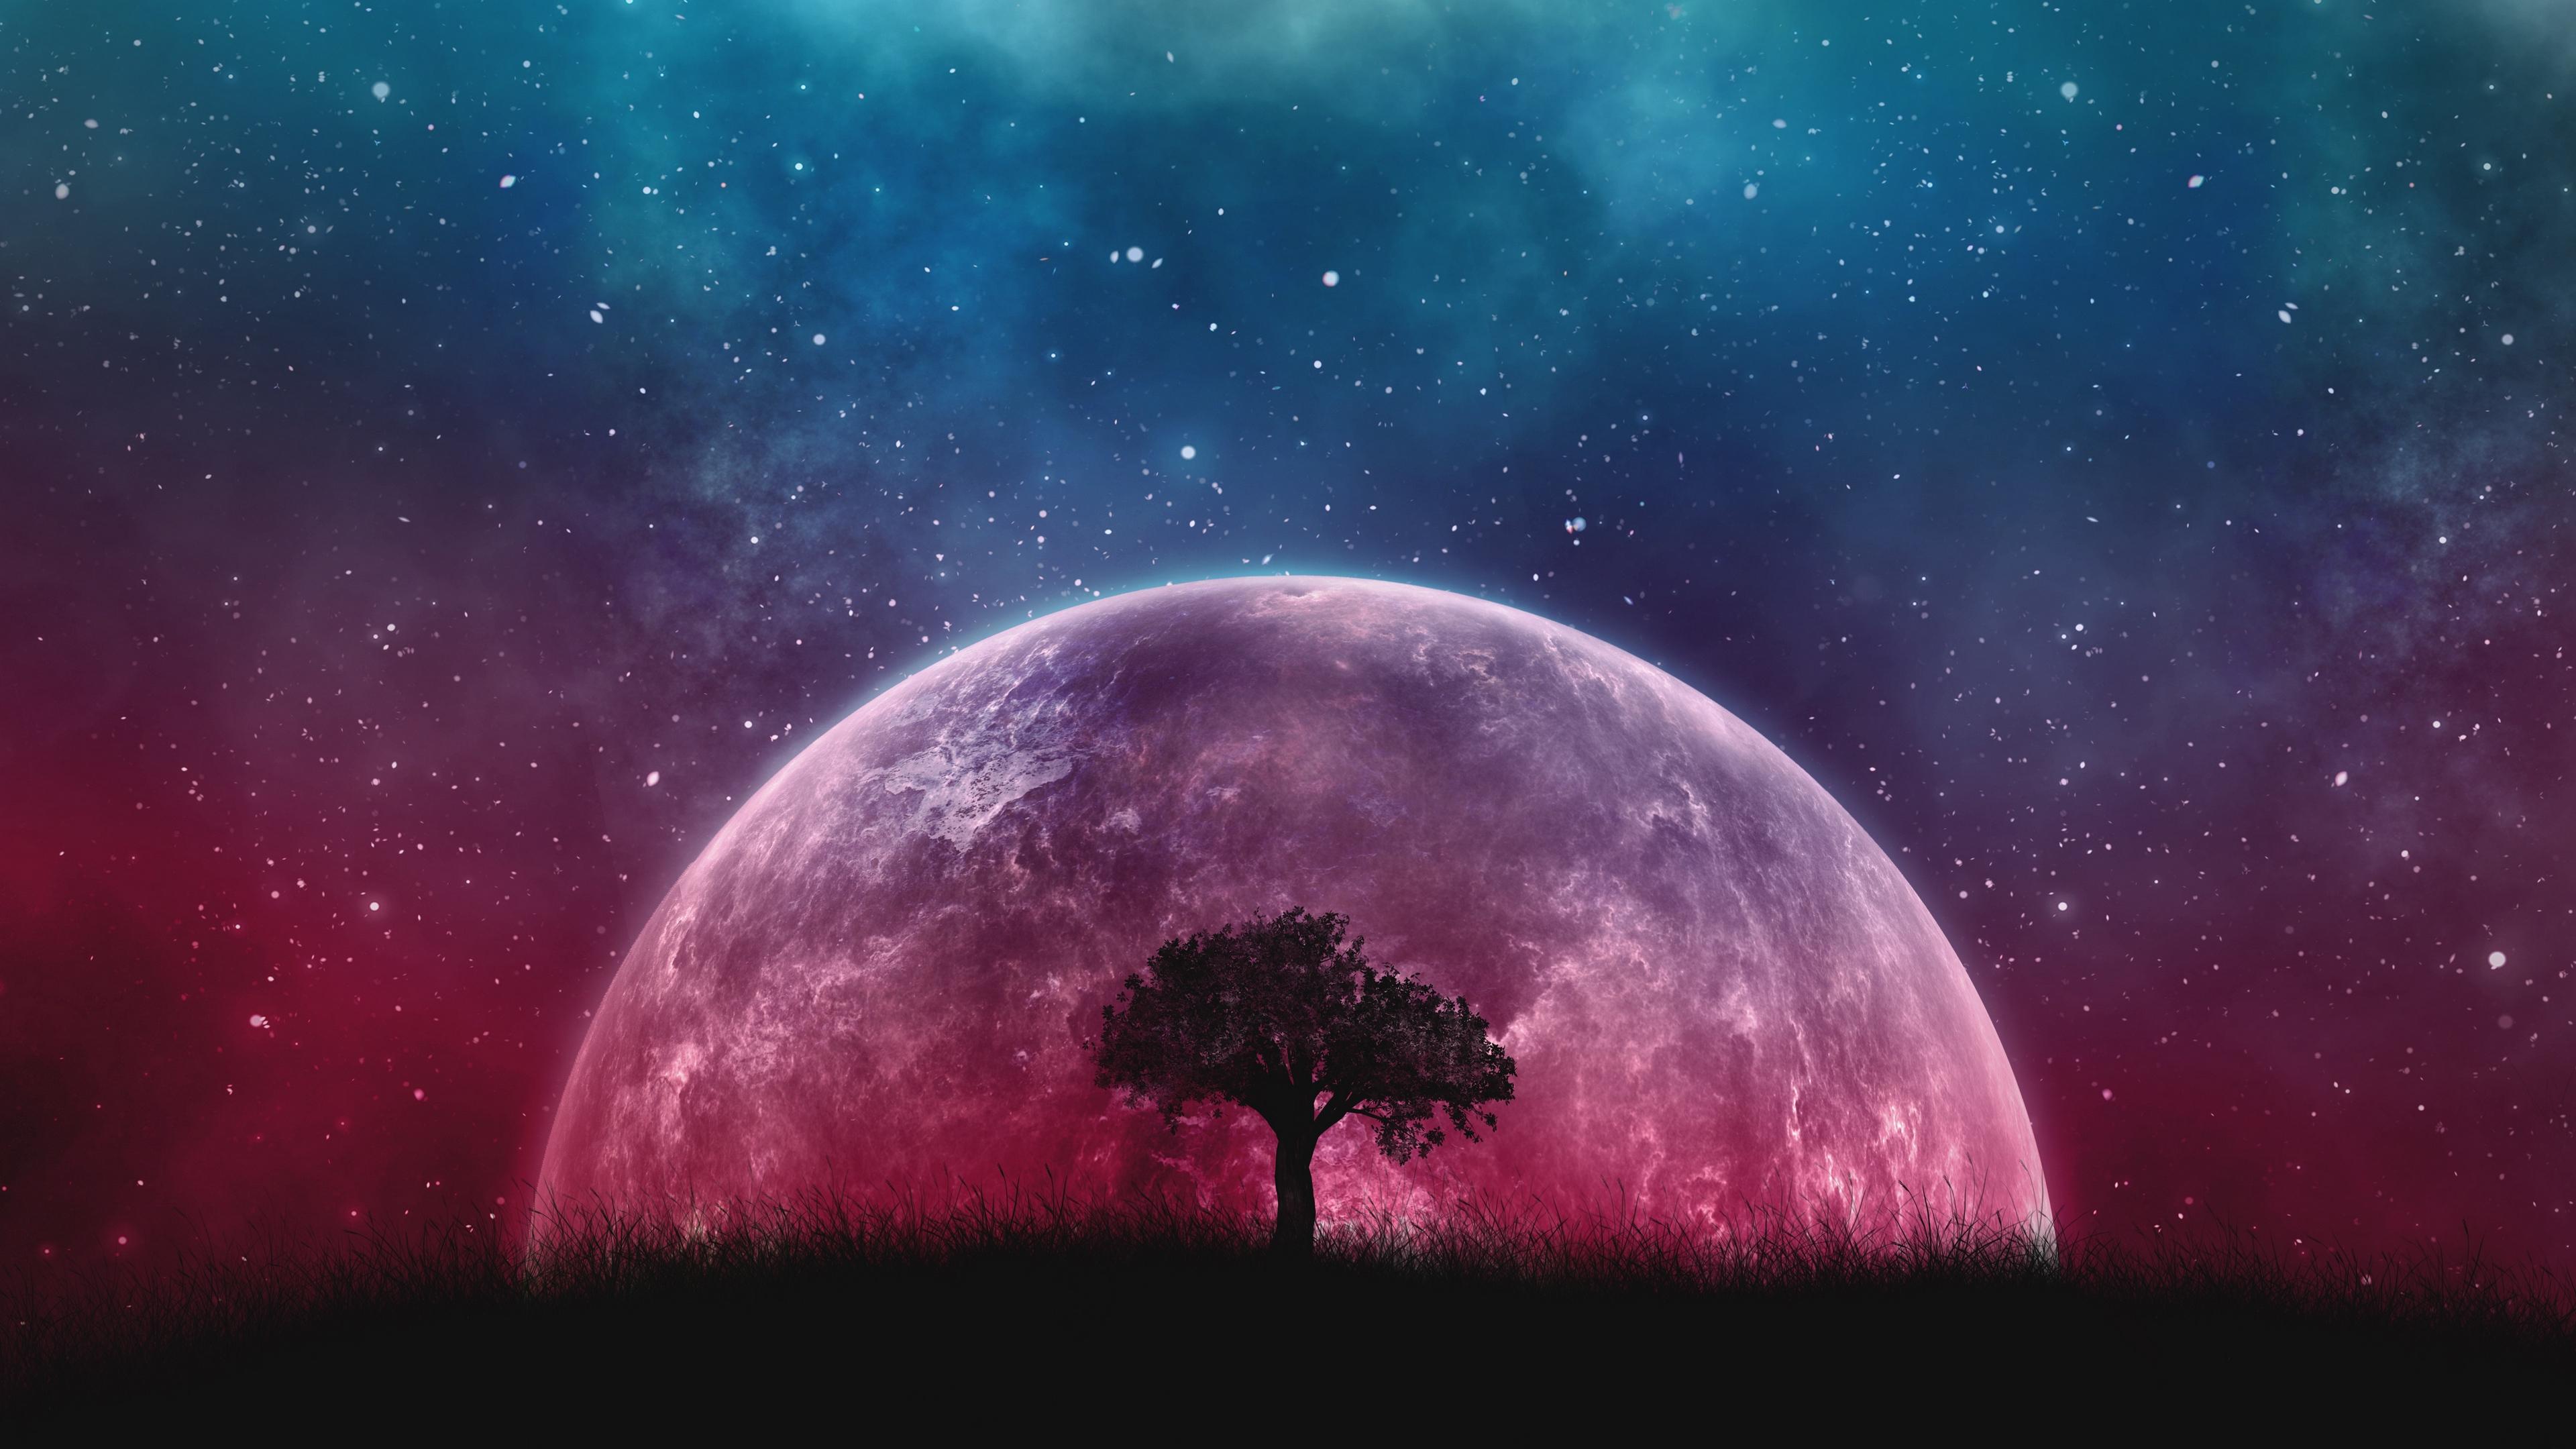 Wallpaper Tree Planet Stars Galaxy Art Galaxy Wallpaper For Laptop 2048x1152 Wallpaper Teahub Io